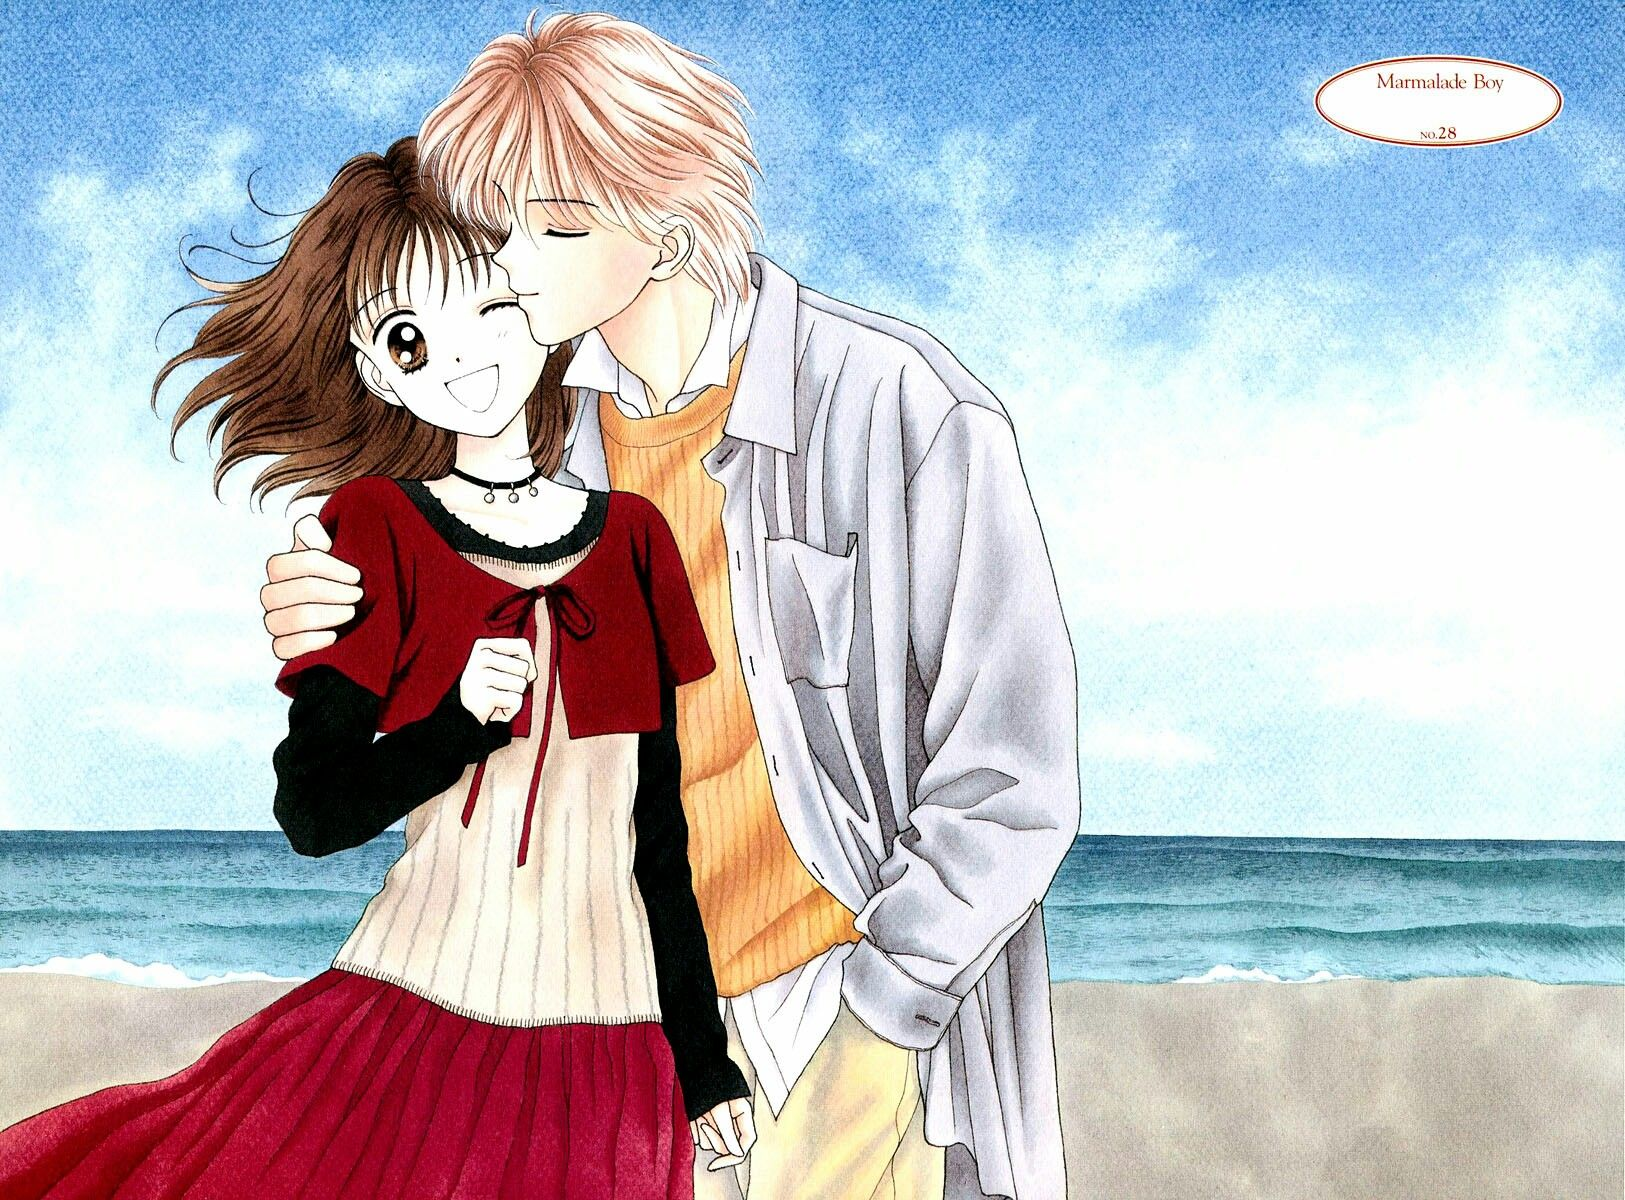 Miki e Yuu Marmalade Boy Arte anime, Dibujos, Kodomo